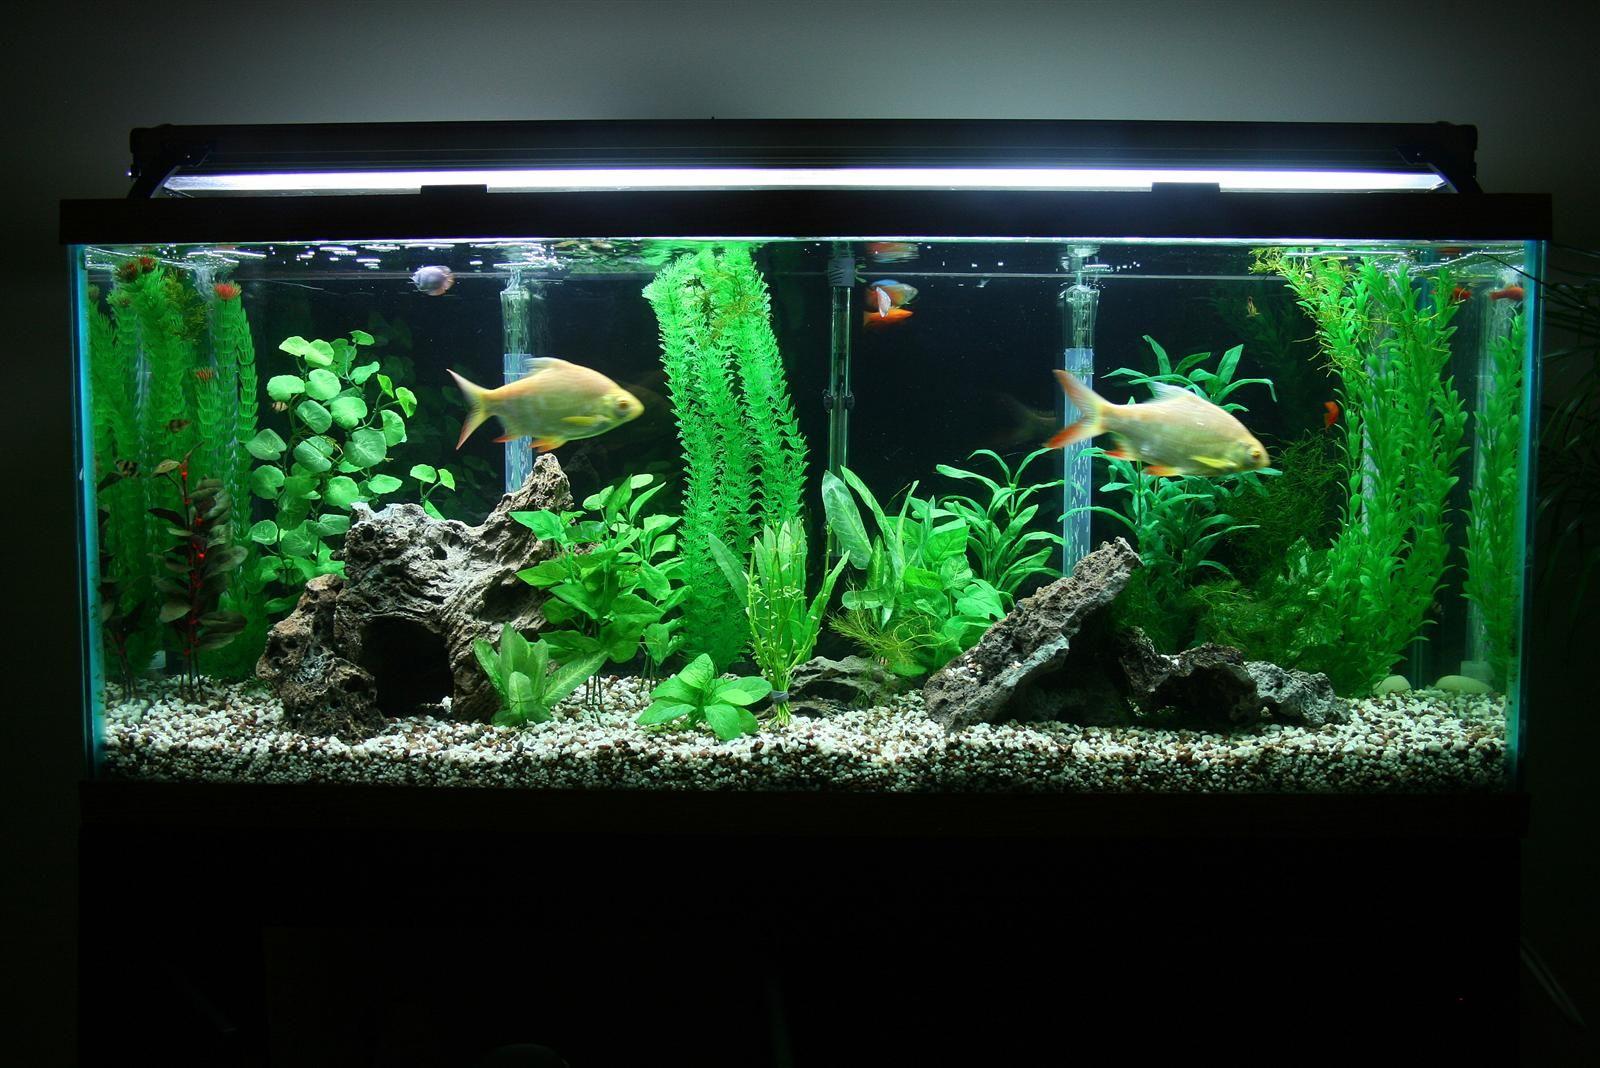 20 gallon fish tank 88 aquarium internal filter 3 in 1 for 20 gallon fish tank decoration ideas